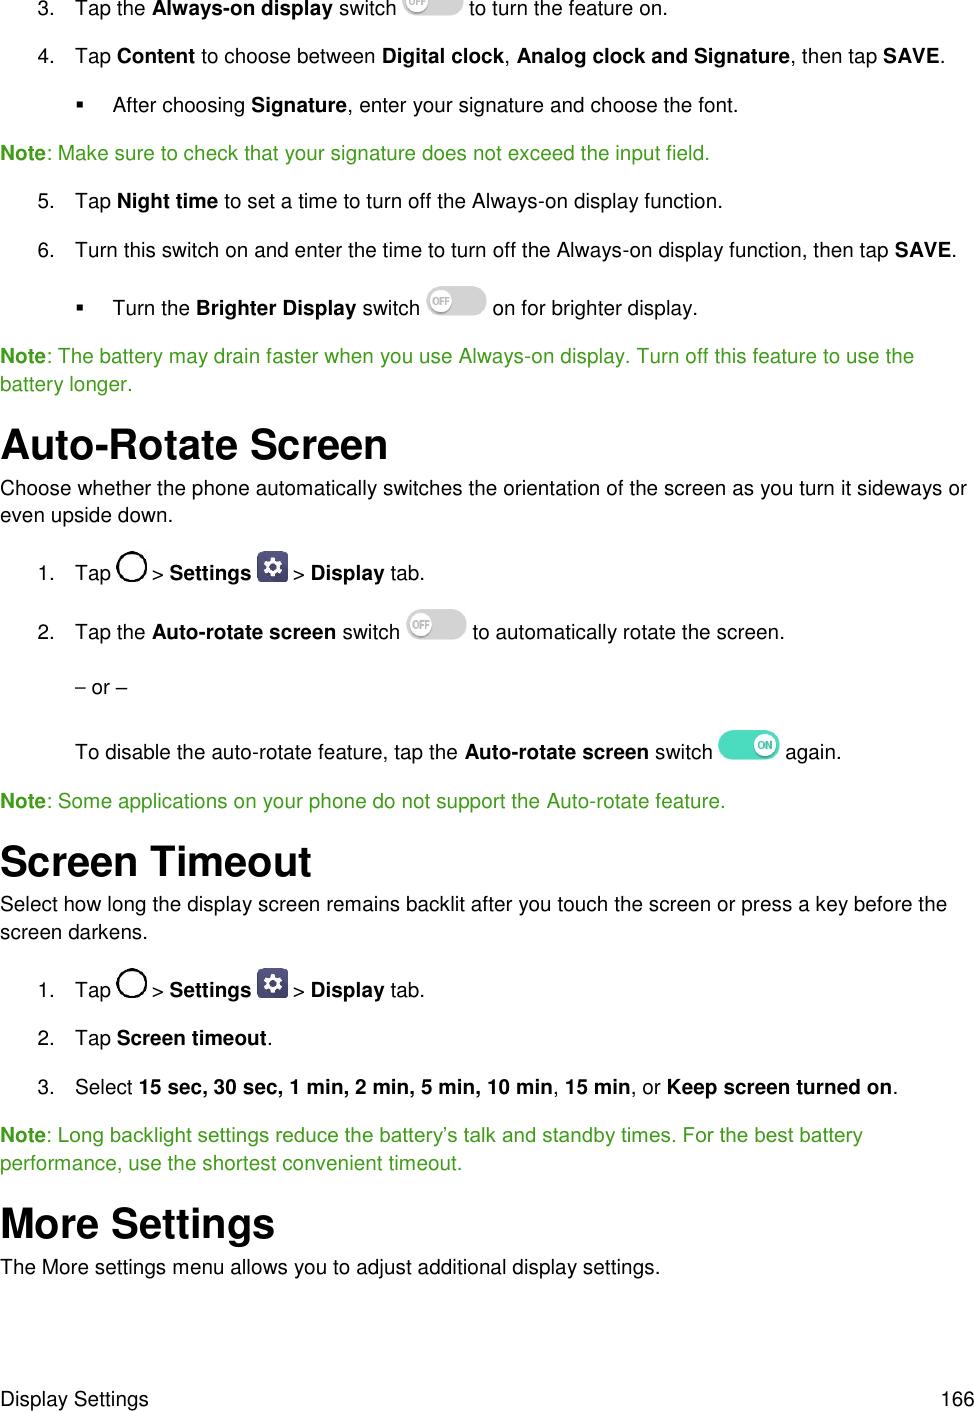 LG LS993 Black User Manual Owner's G6 Sprint English